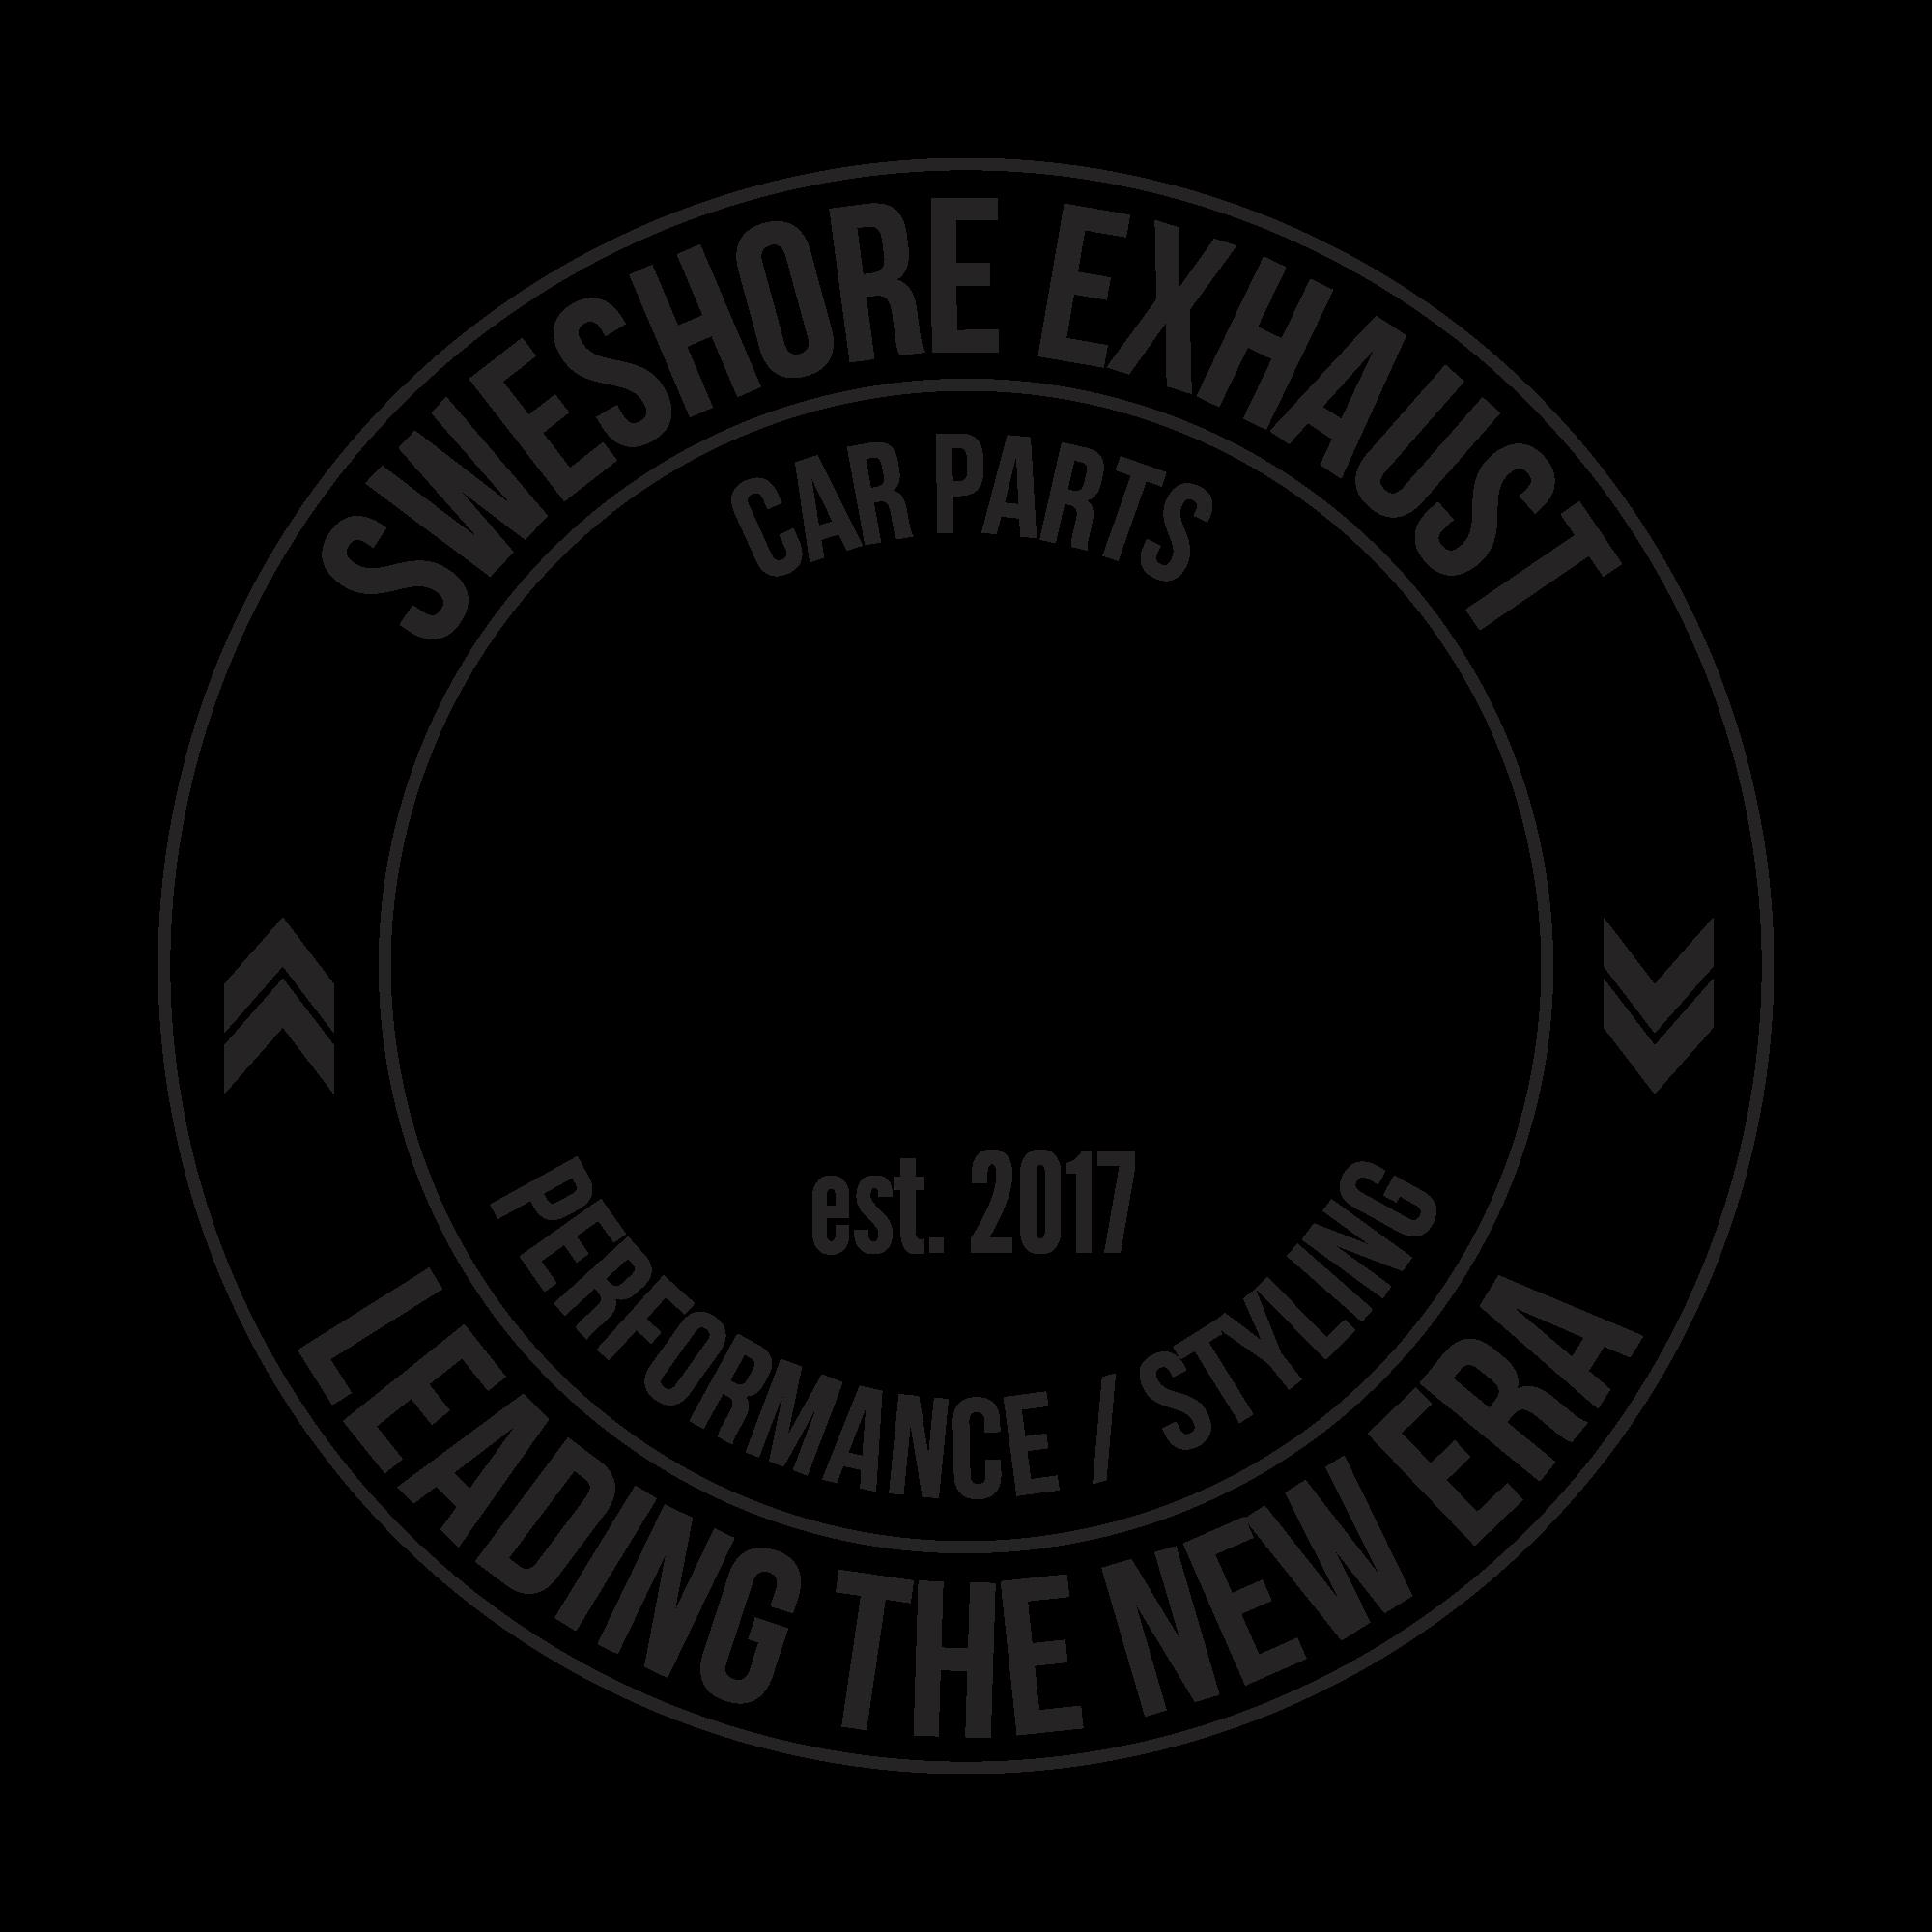 SWESHORE EXHAUST > SWESHORE EXAHAUST